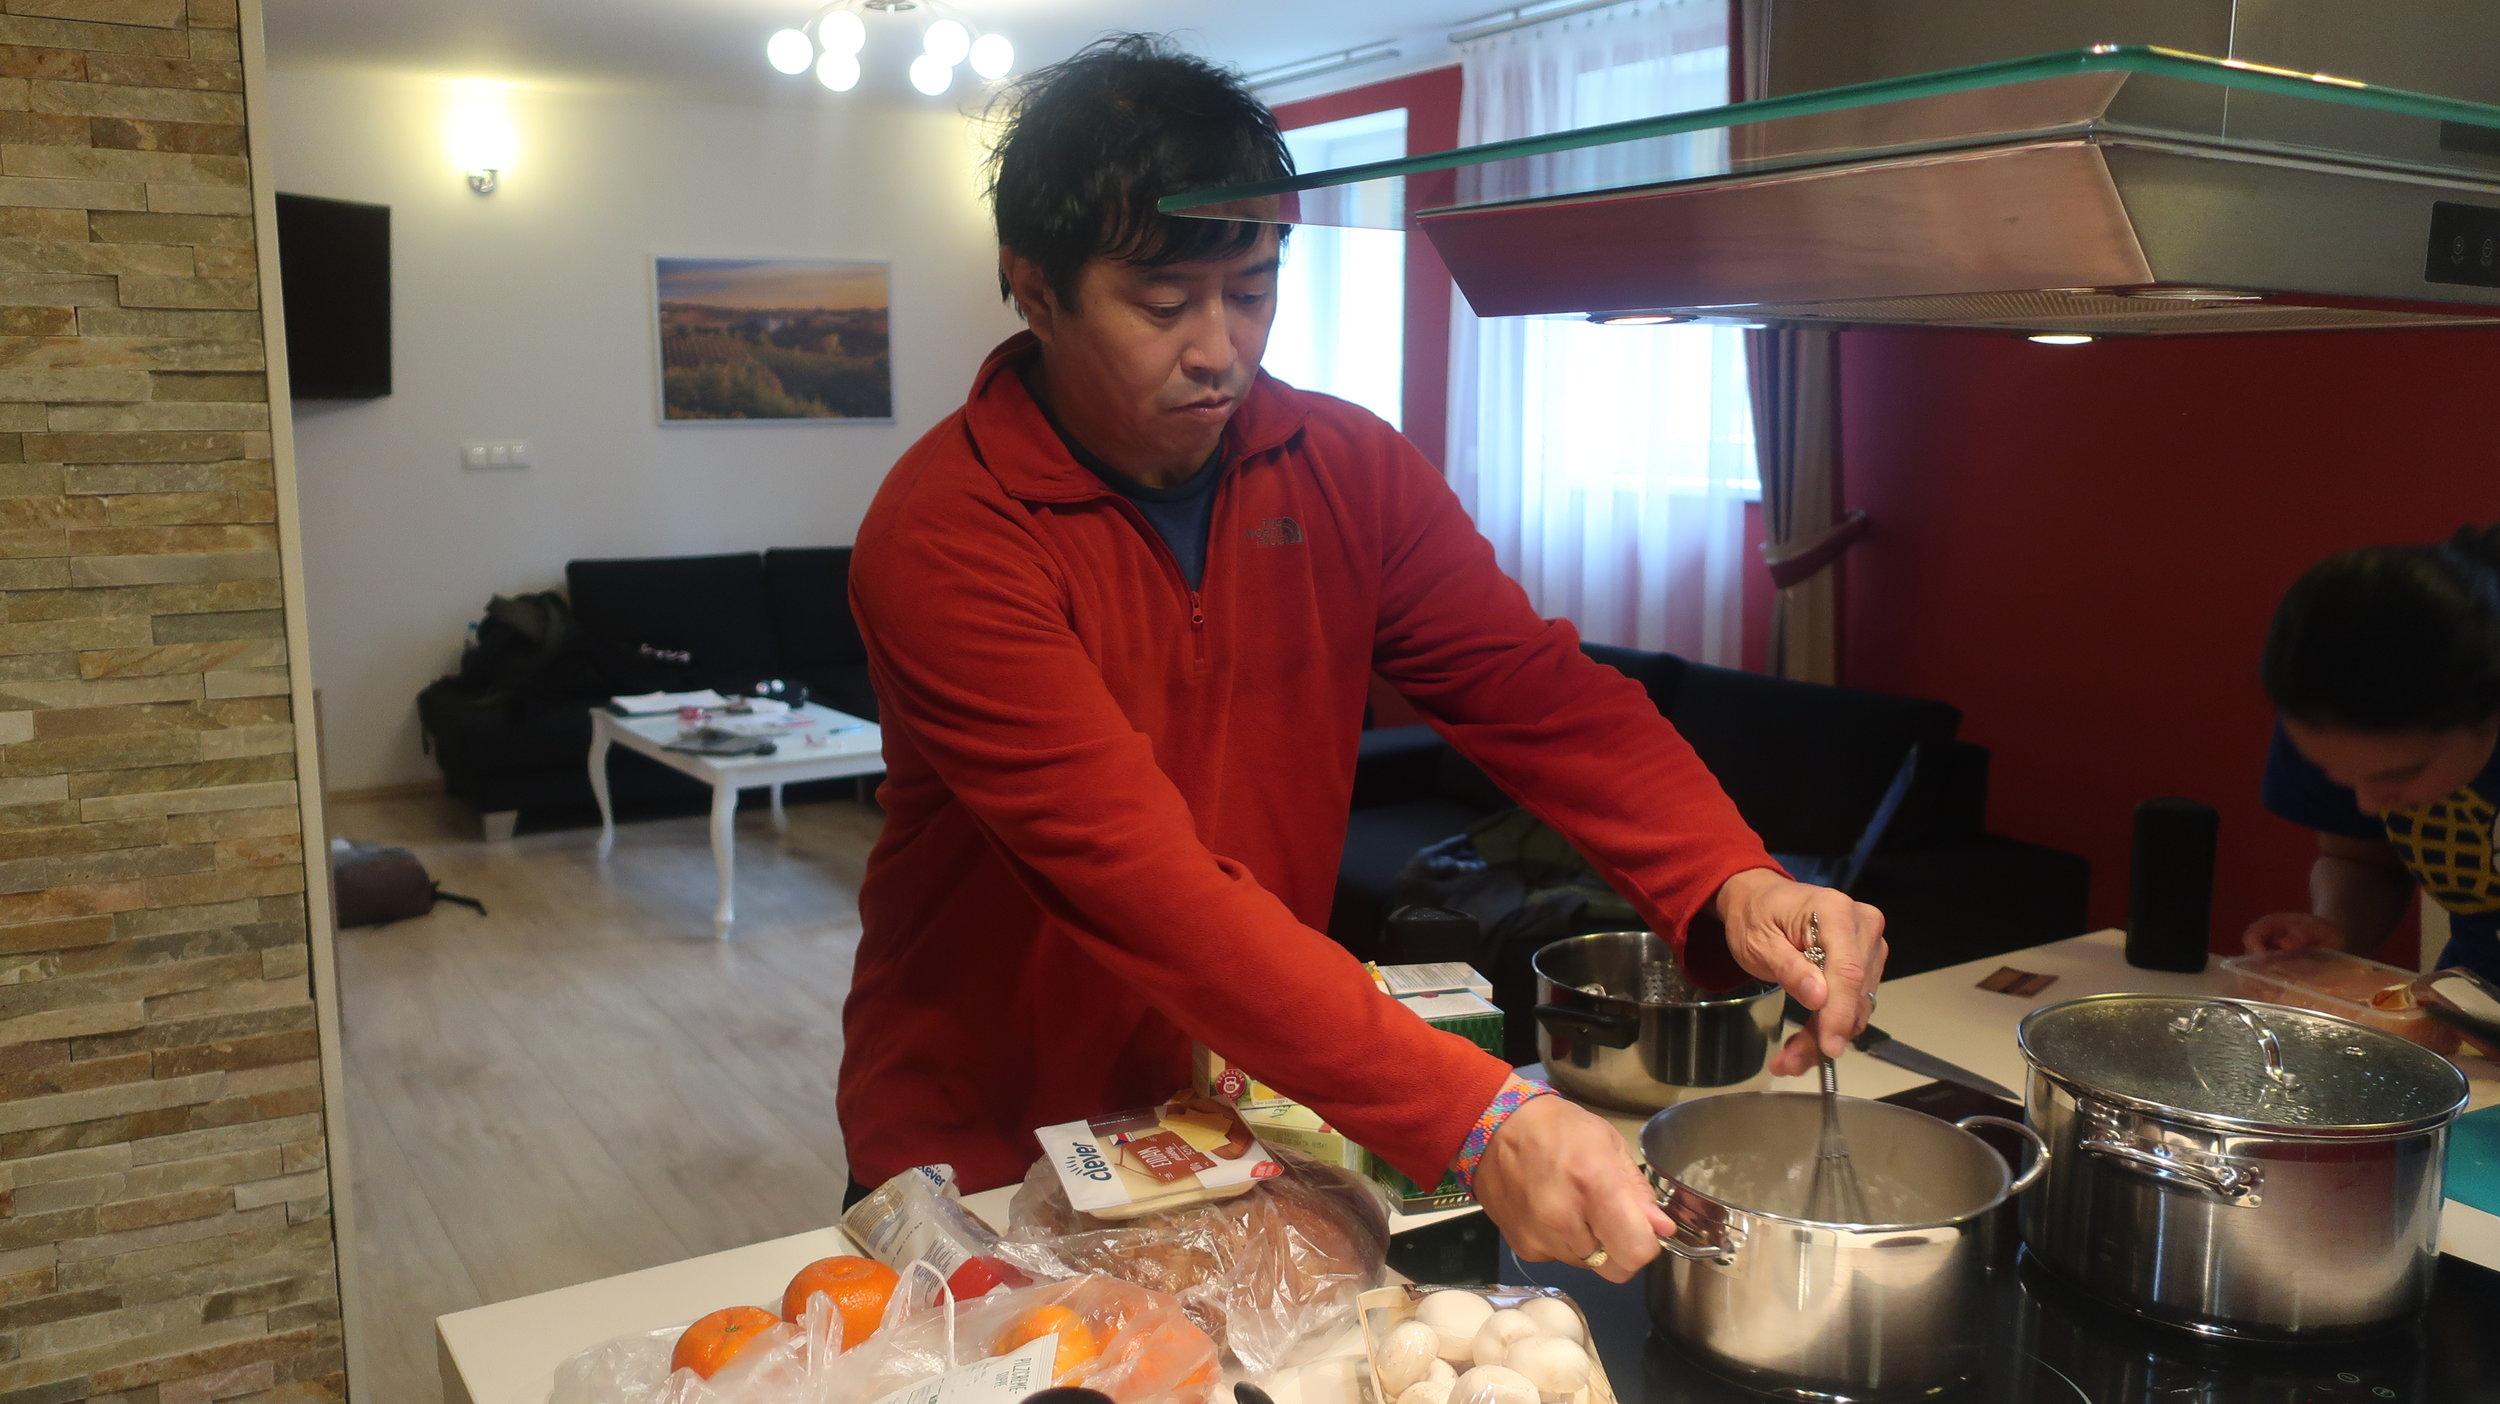 Kenzo-san preparing dinner